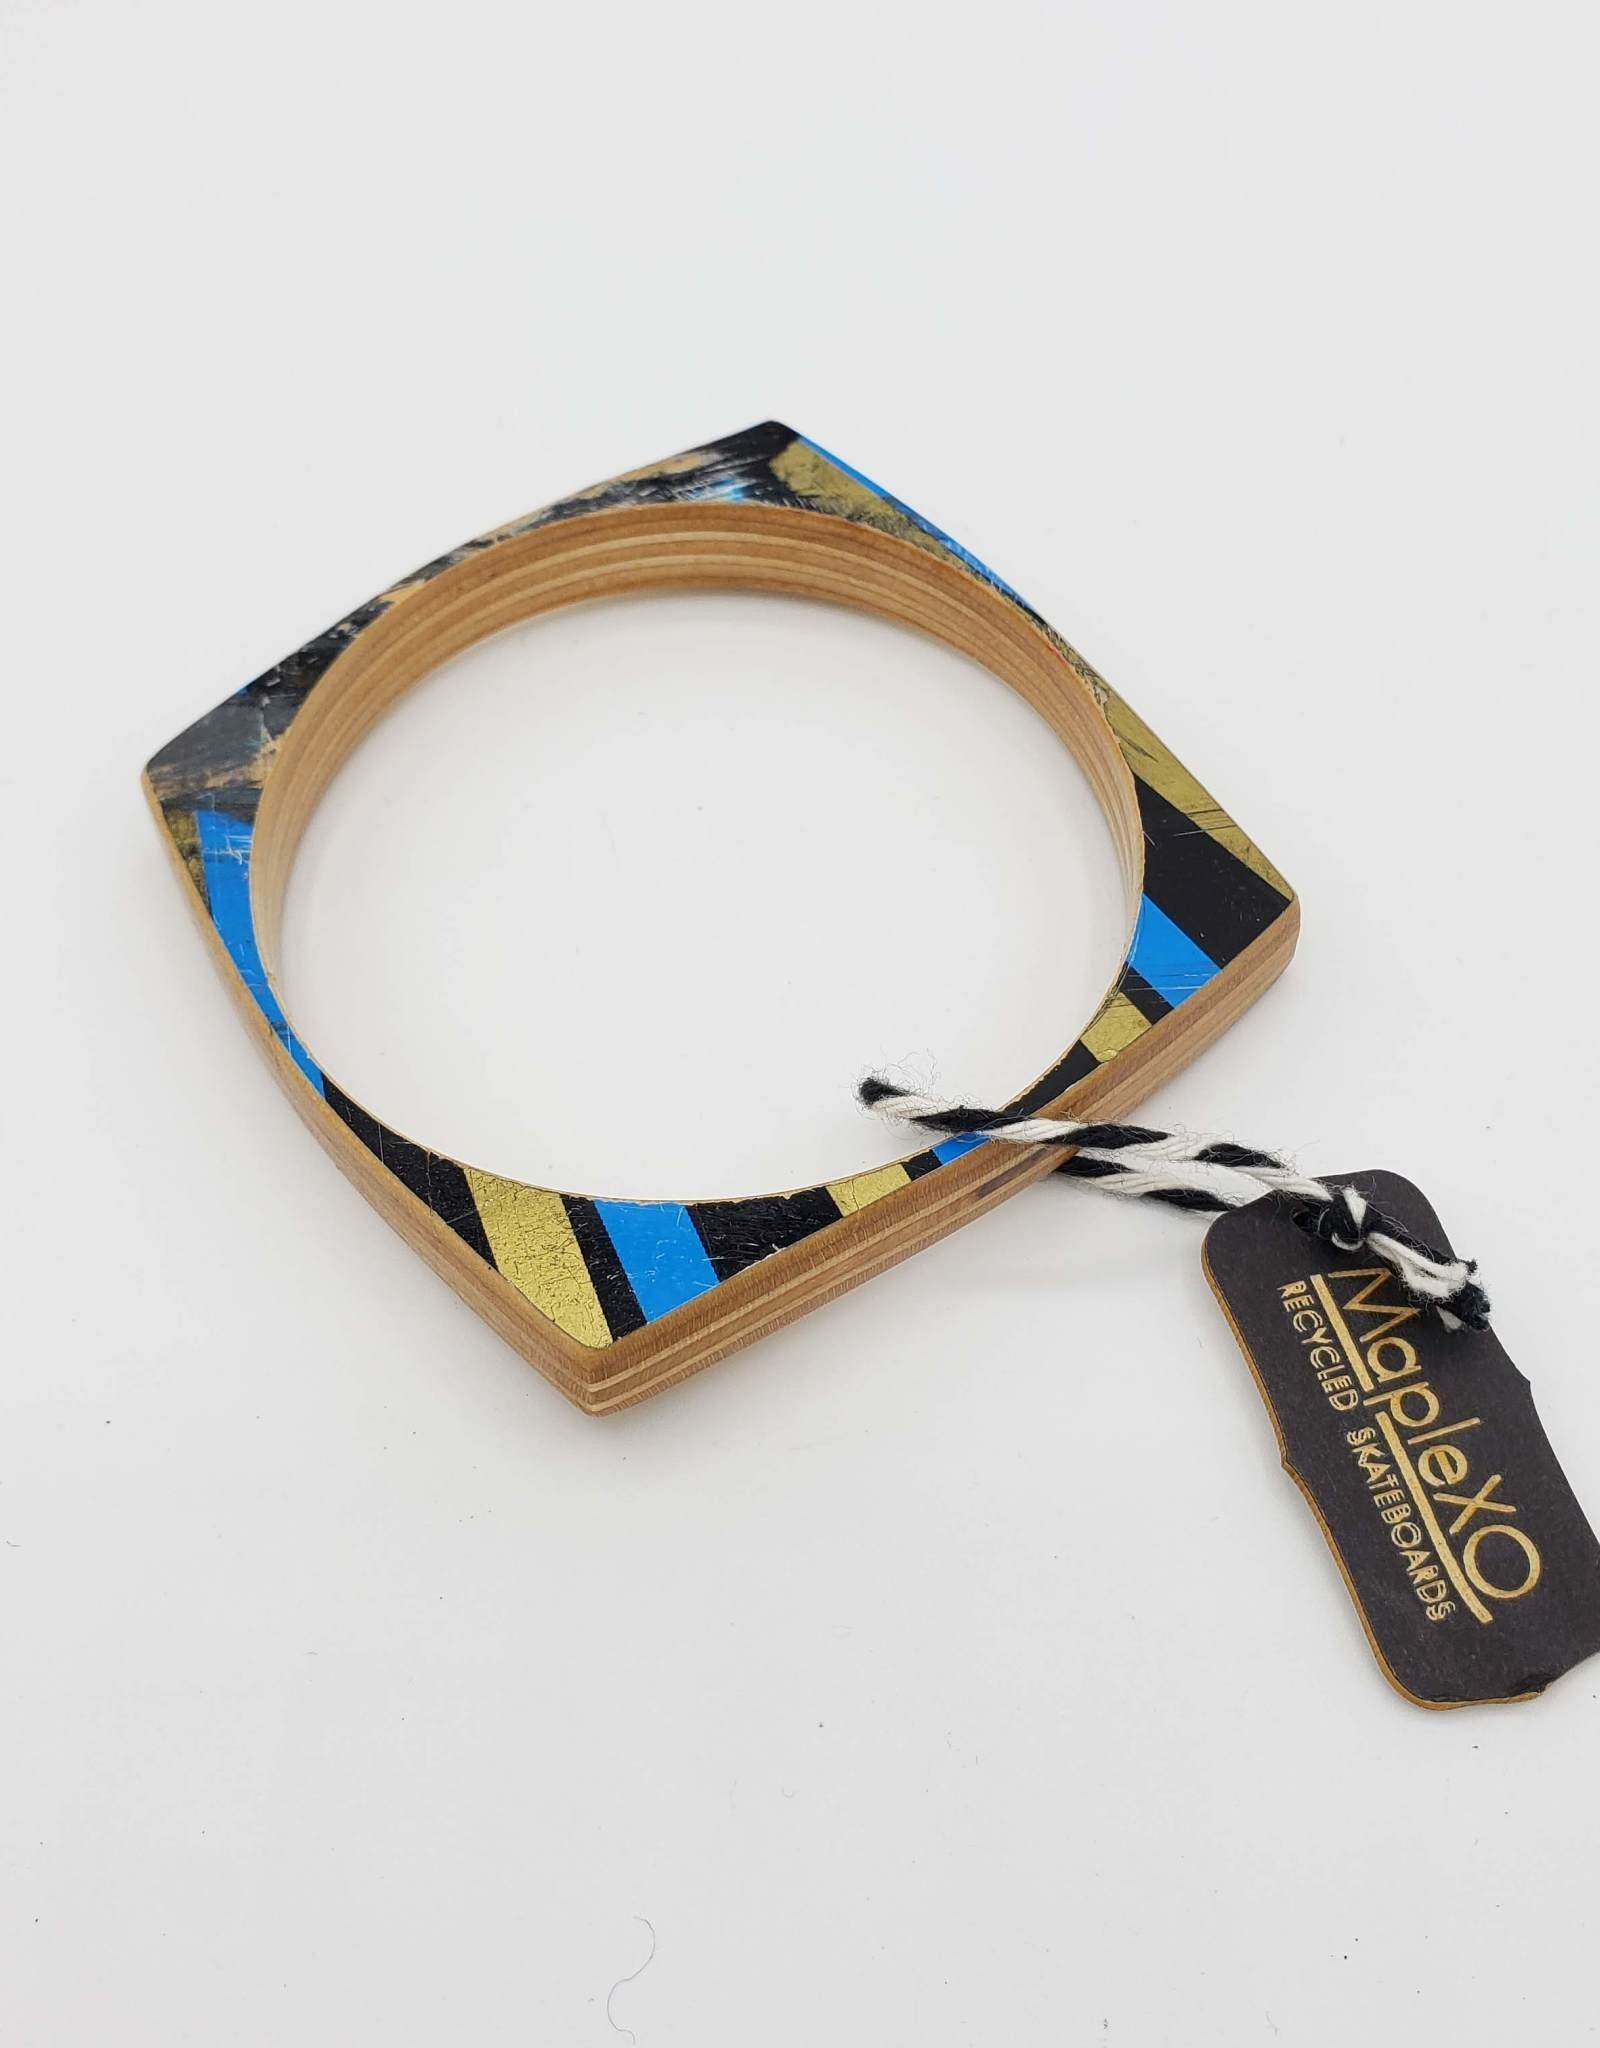 Maple XO Boxcar Bangle Bracelet - Maple XO